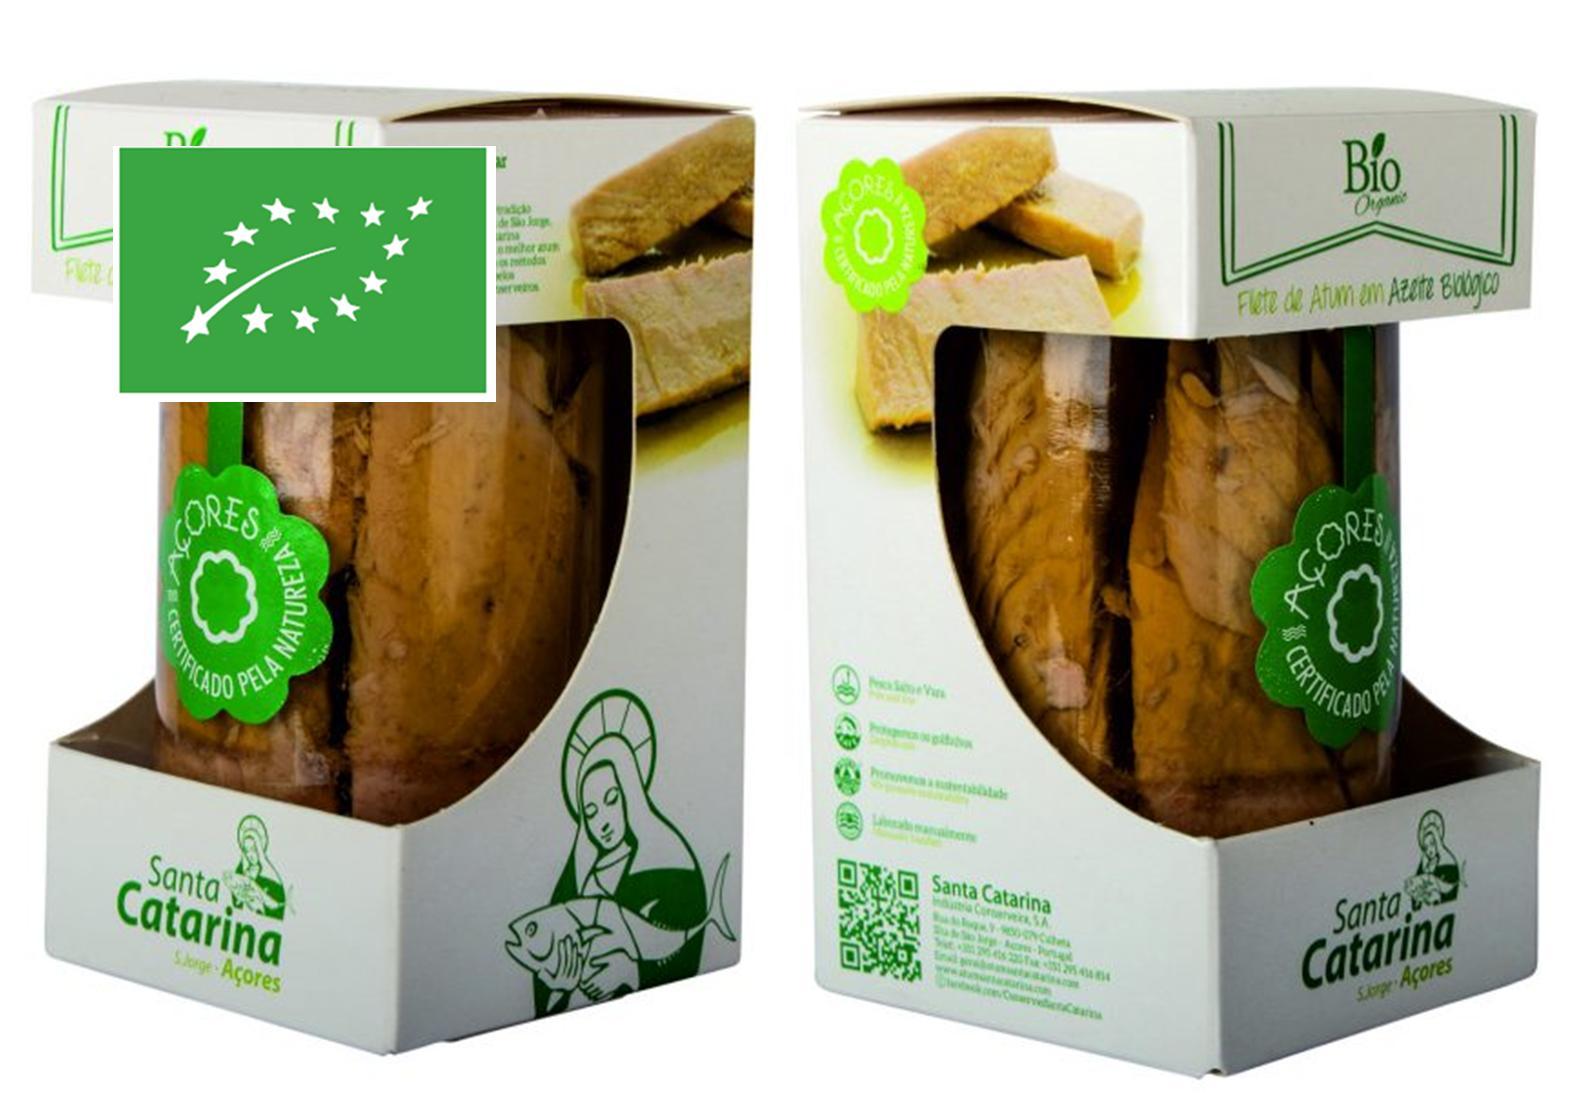 2 Filets de thon BIO 250g - Santa Catarina - Conserves de thon bonito des Açores